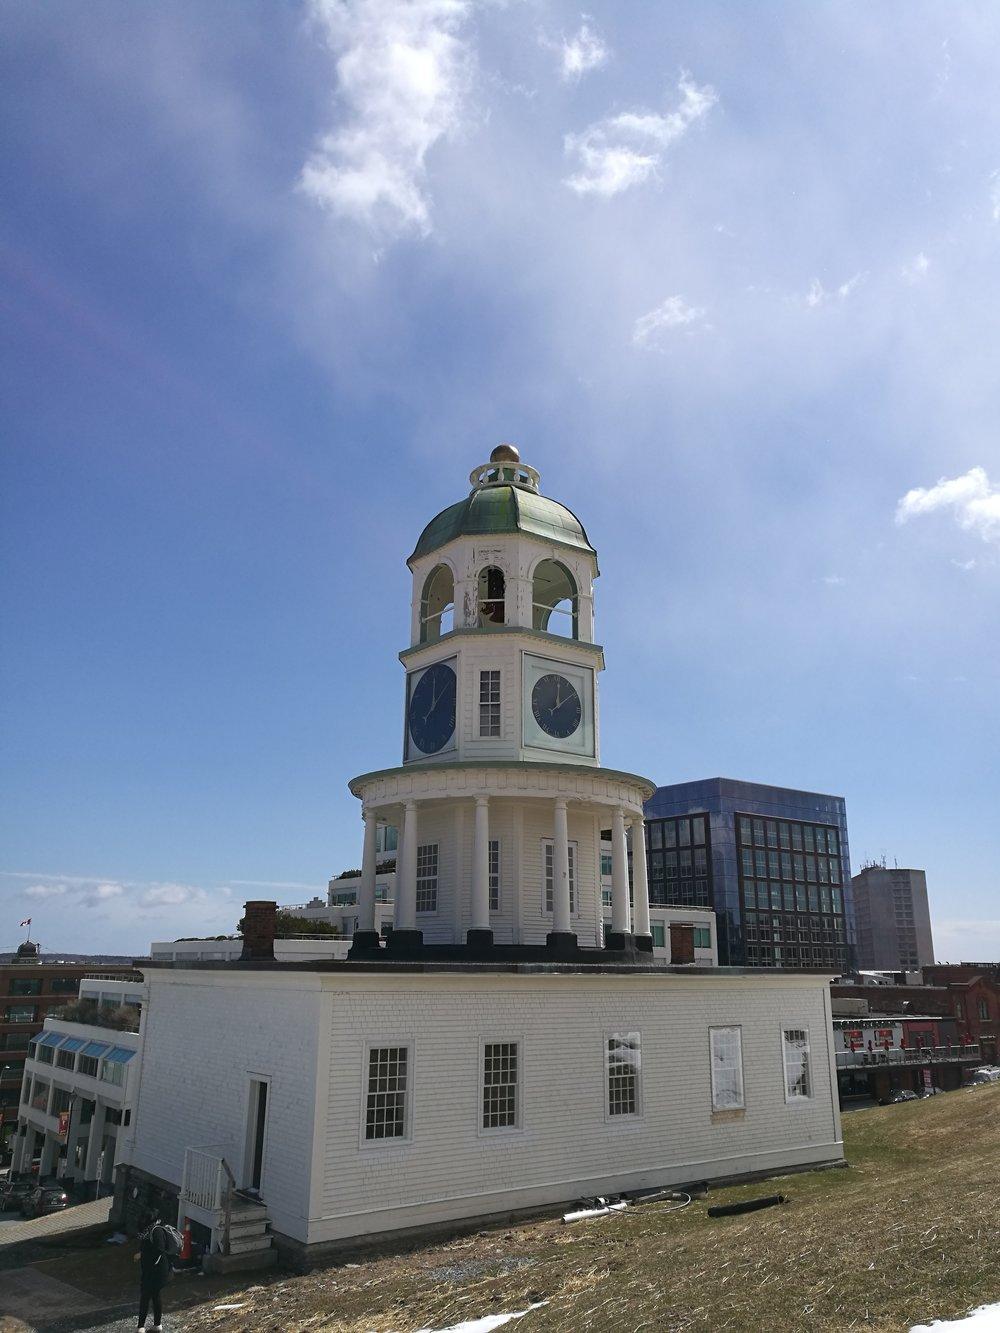 Town Clock, Halifax